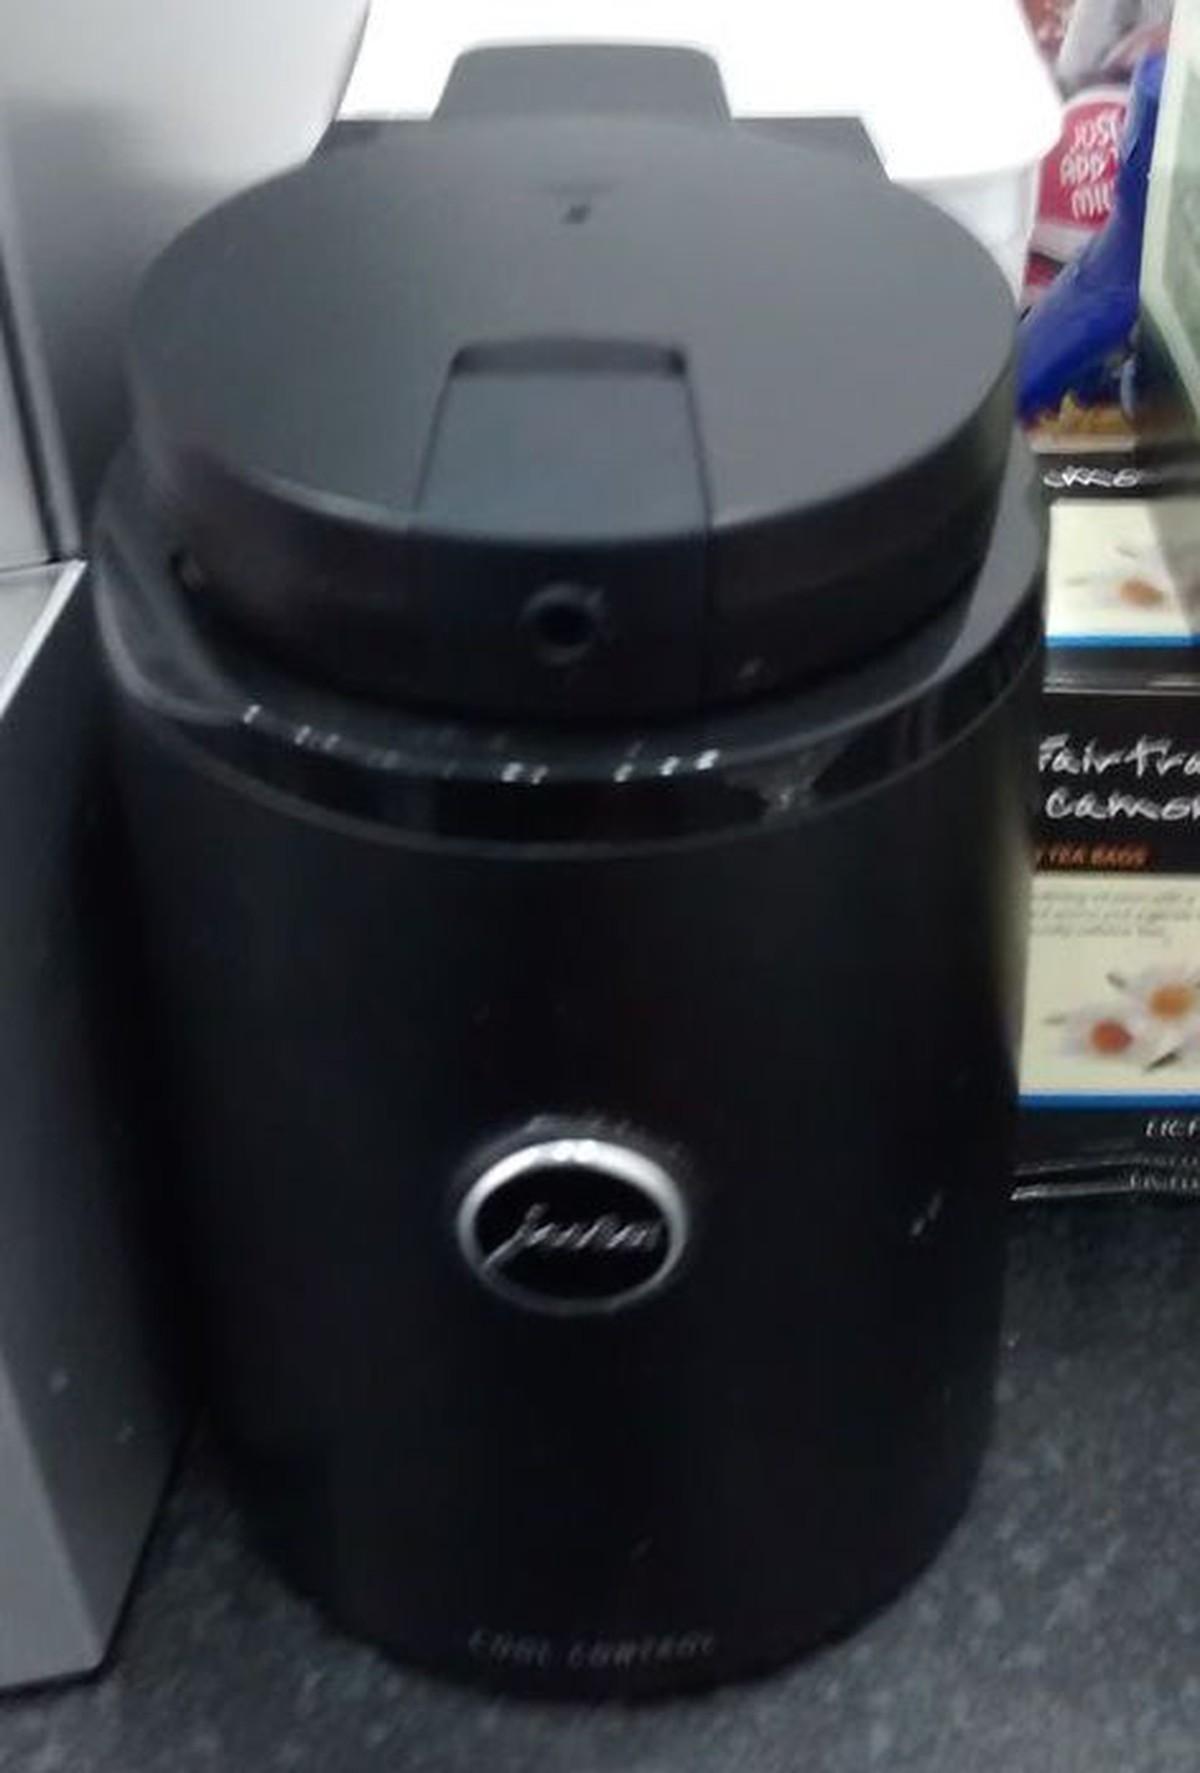 used jura coffee machine